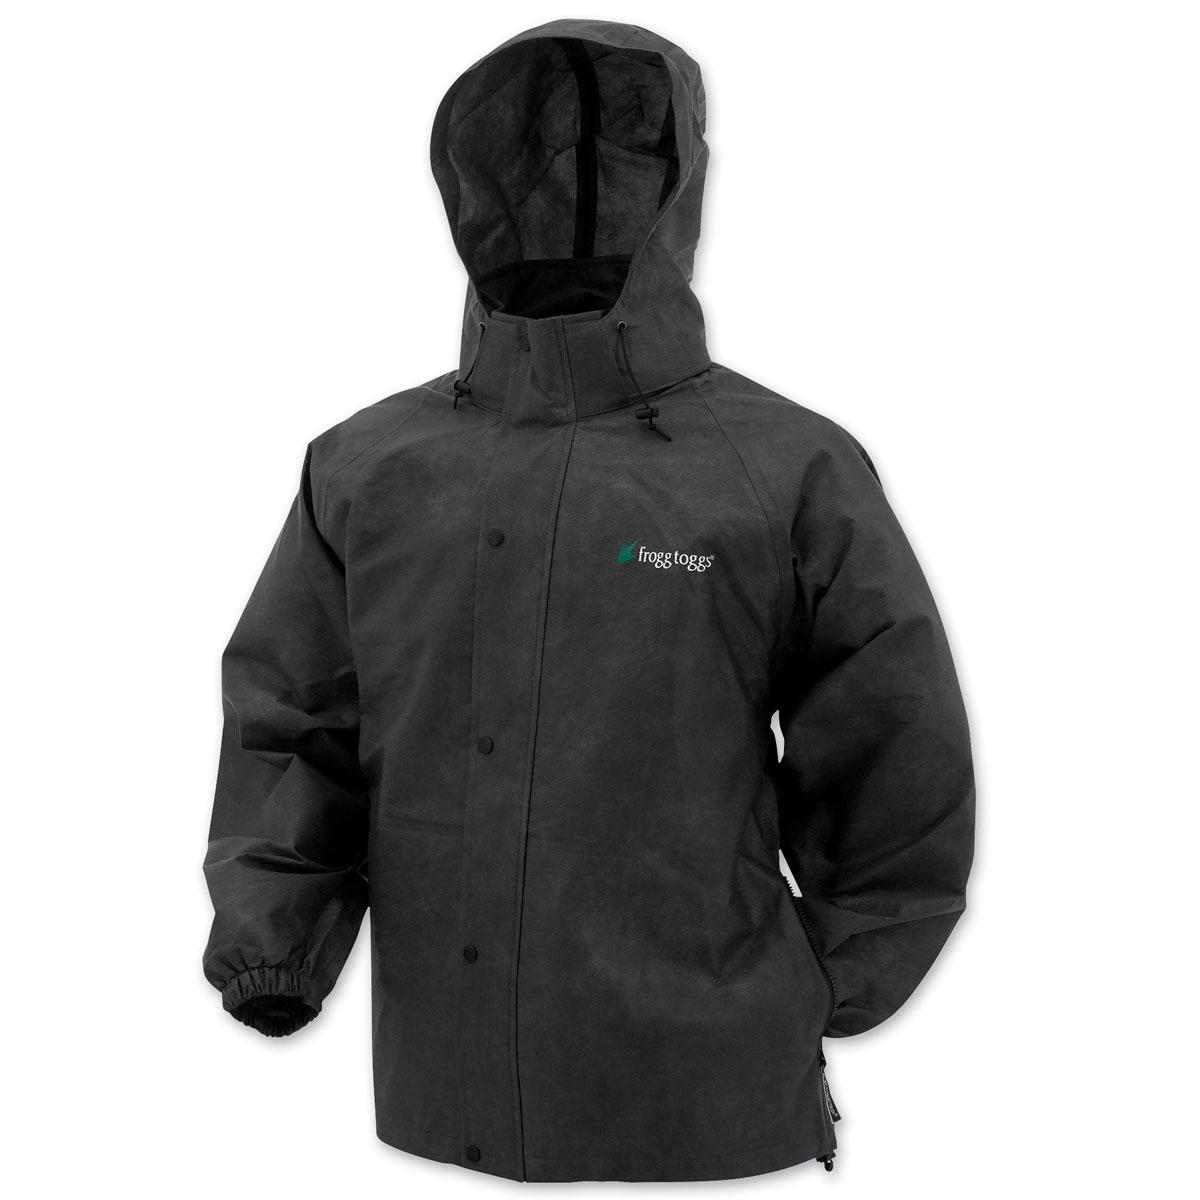 Frogg Toggs Men's Pro Action Black Rain Jacket